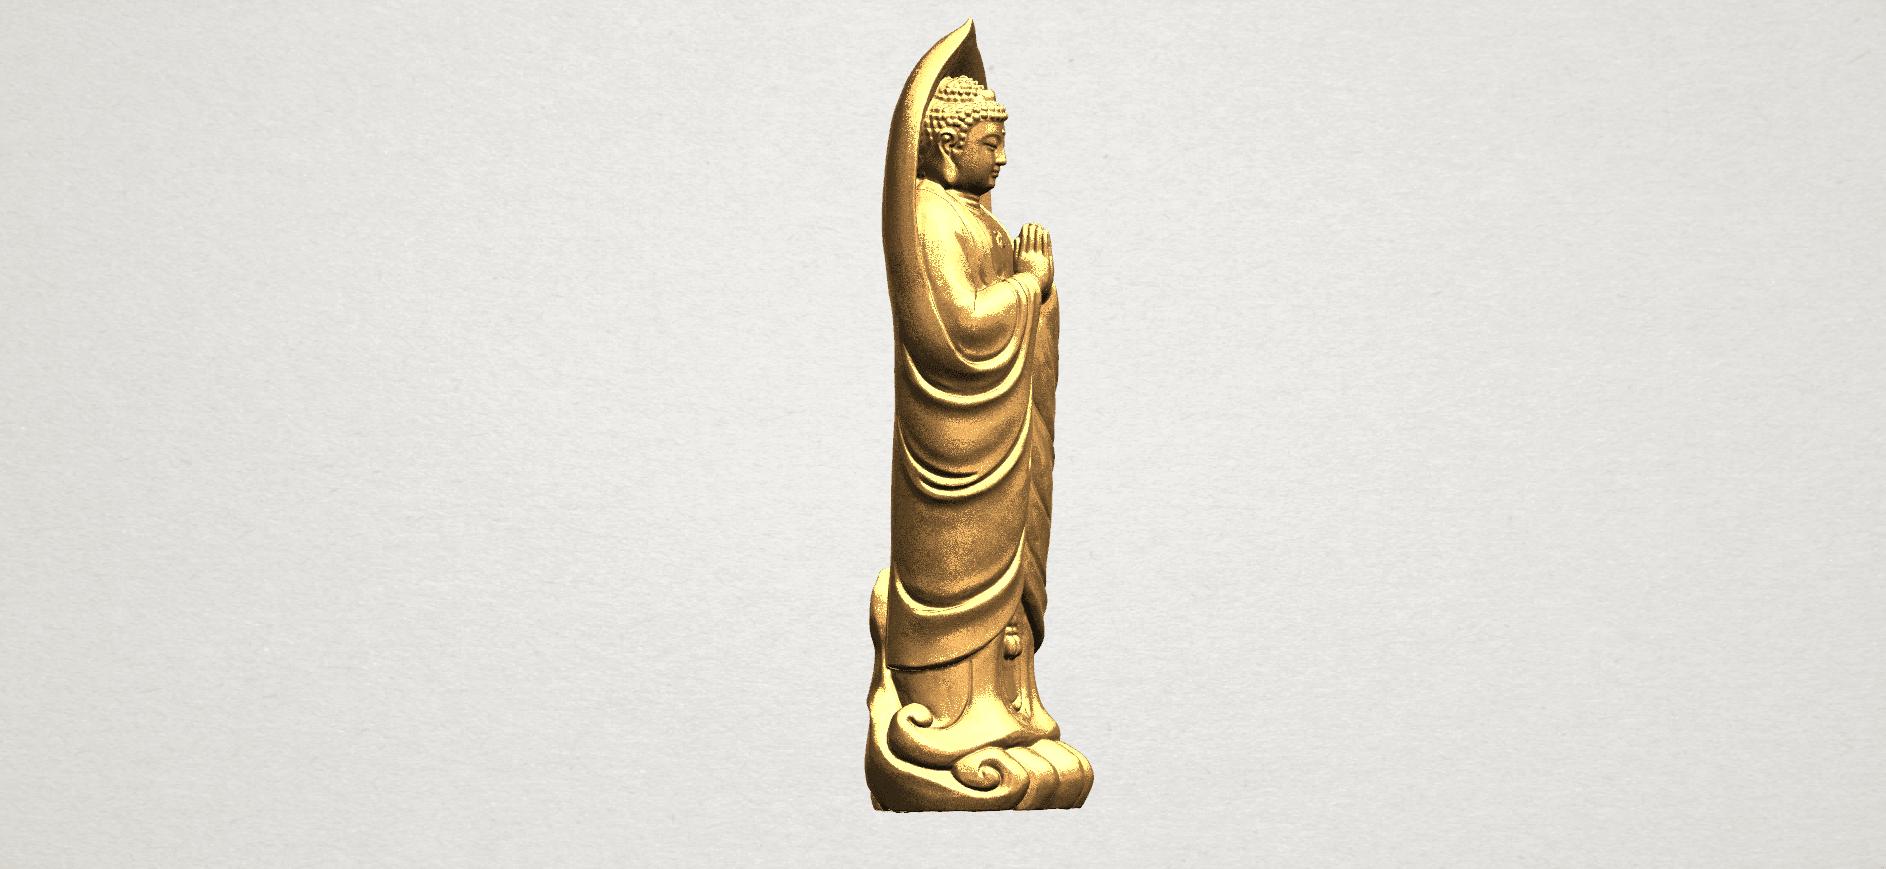 Gautama Buddha Standing (iv) A06.png Download free STL file Gautama Buddha Standing 04 • 3D printable design, GeorgesNikkei